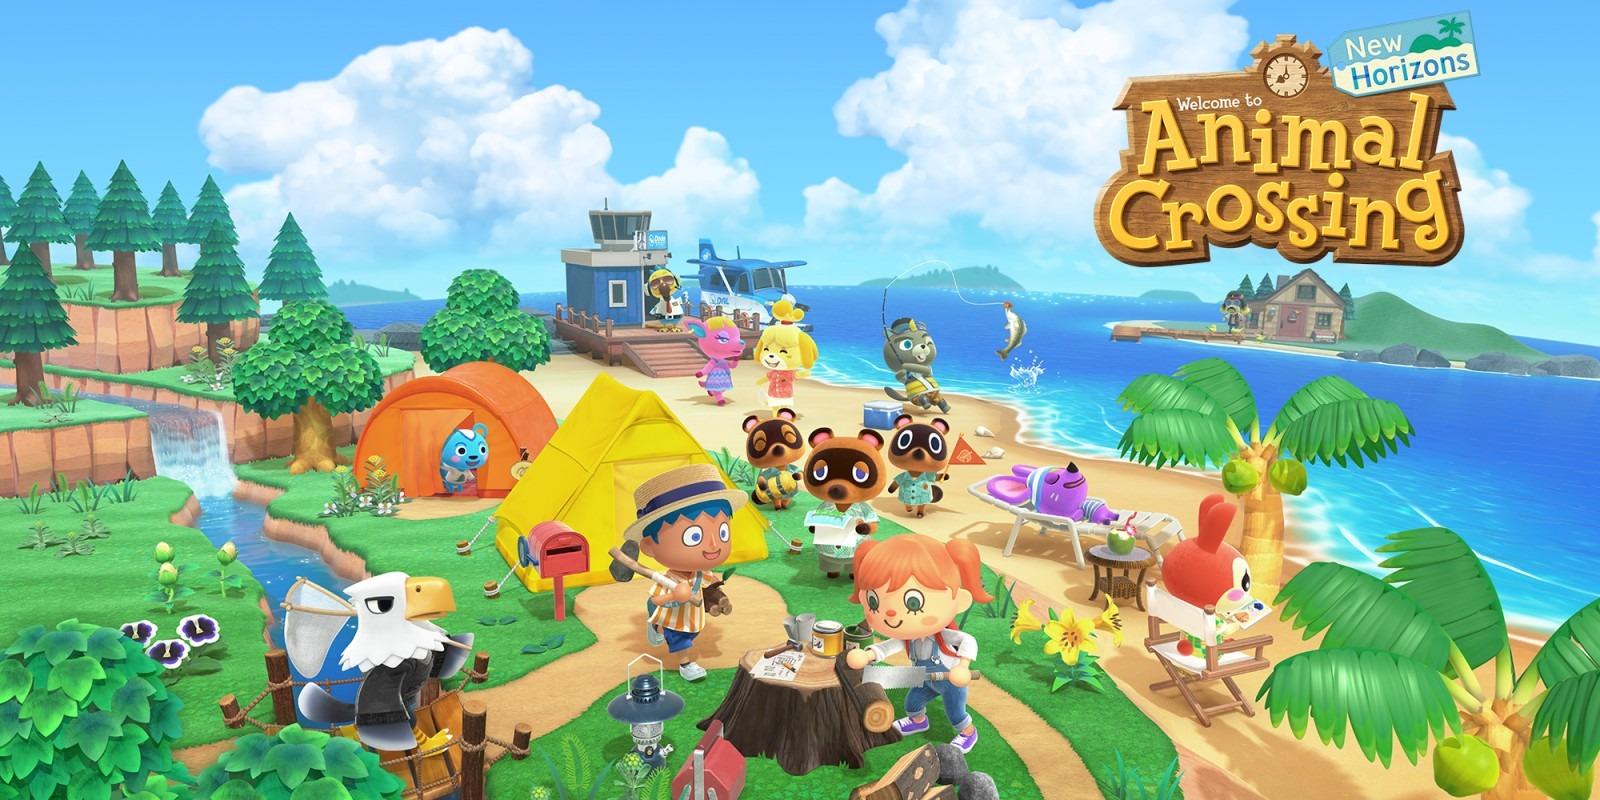 Nuovi gadget di Animal Crossing: New Horizons prenotando da Amazon Japan